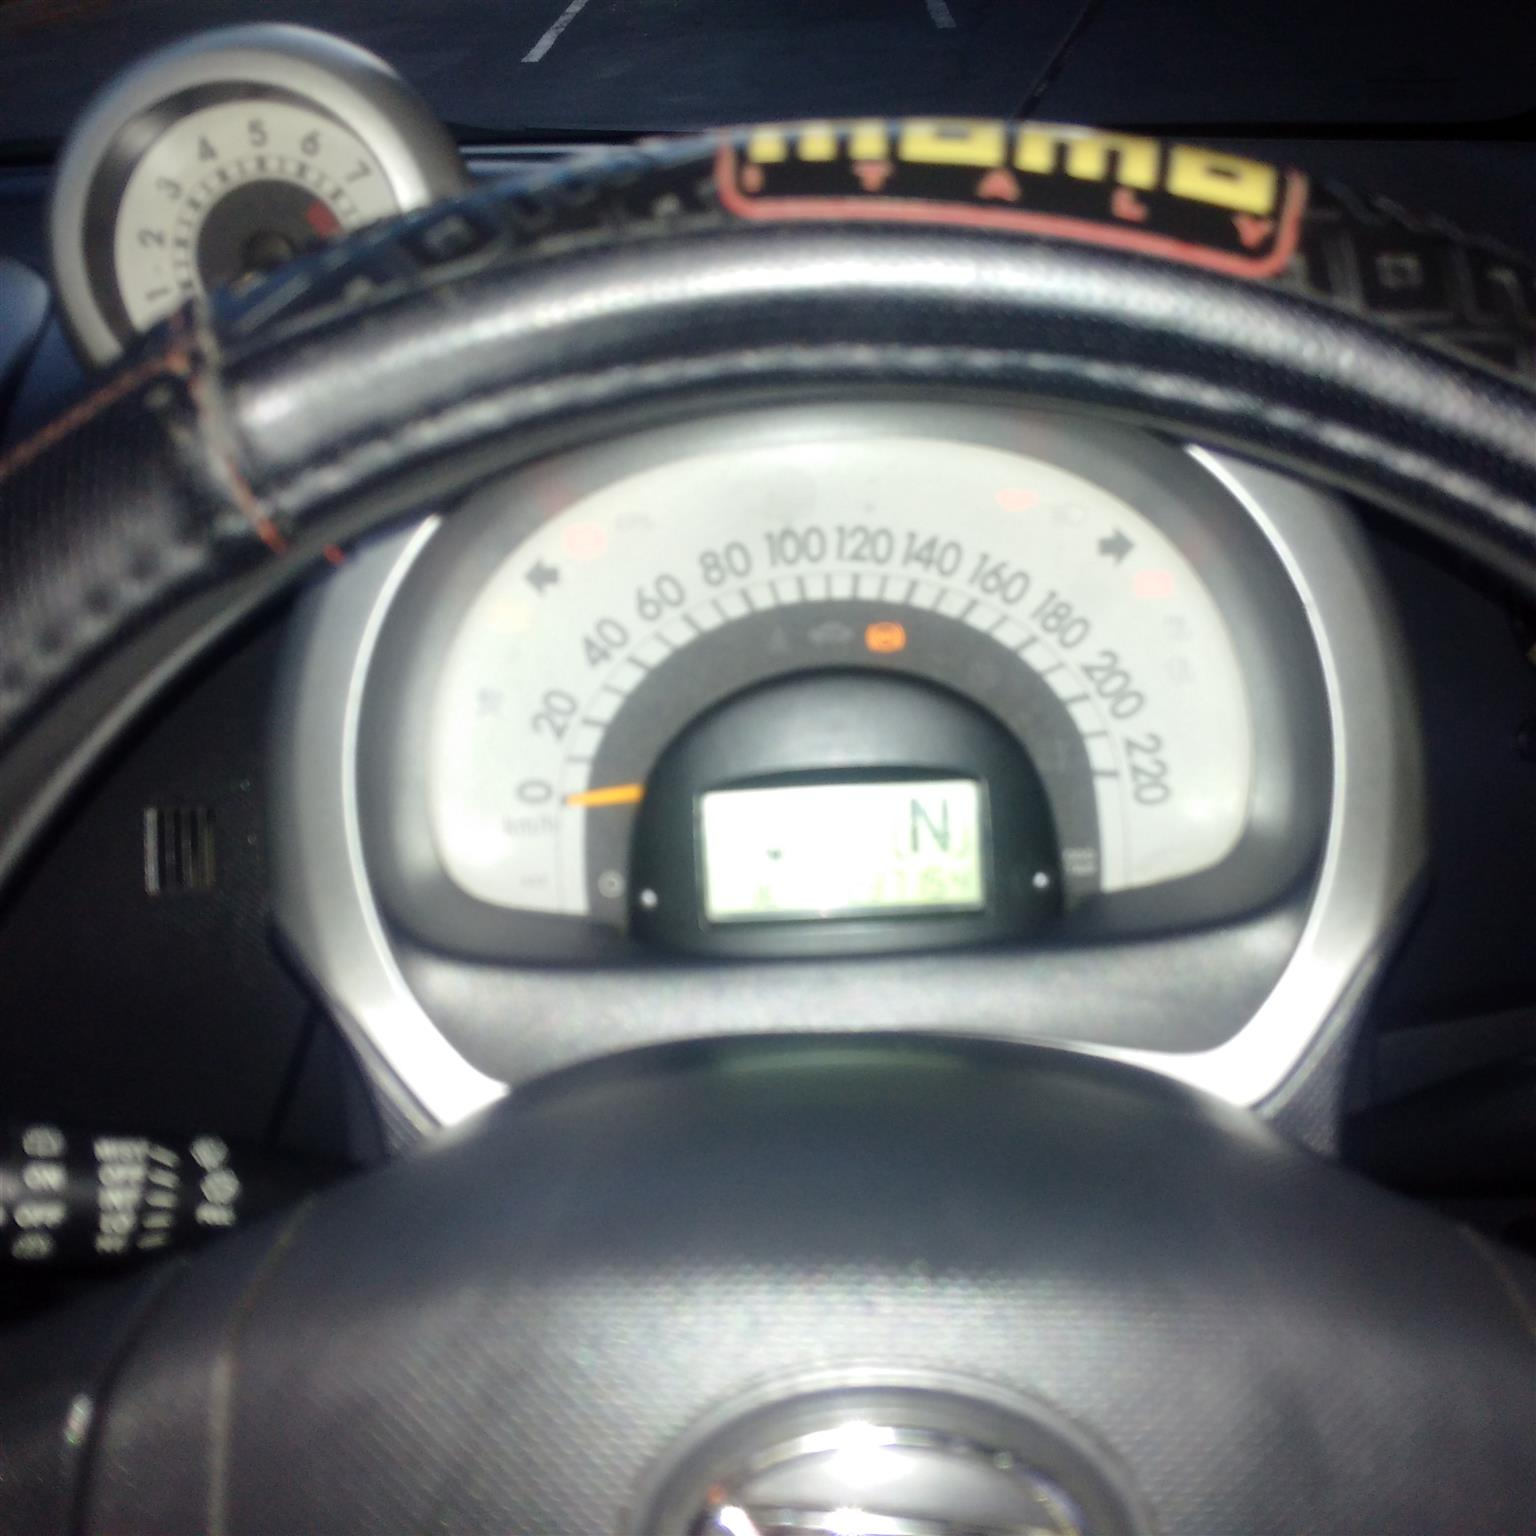 2005 Daihatsu Sirion 1.3 automatic